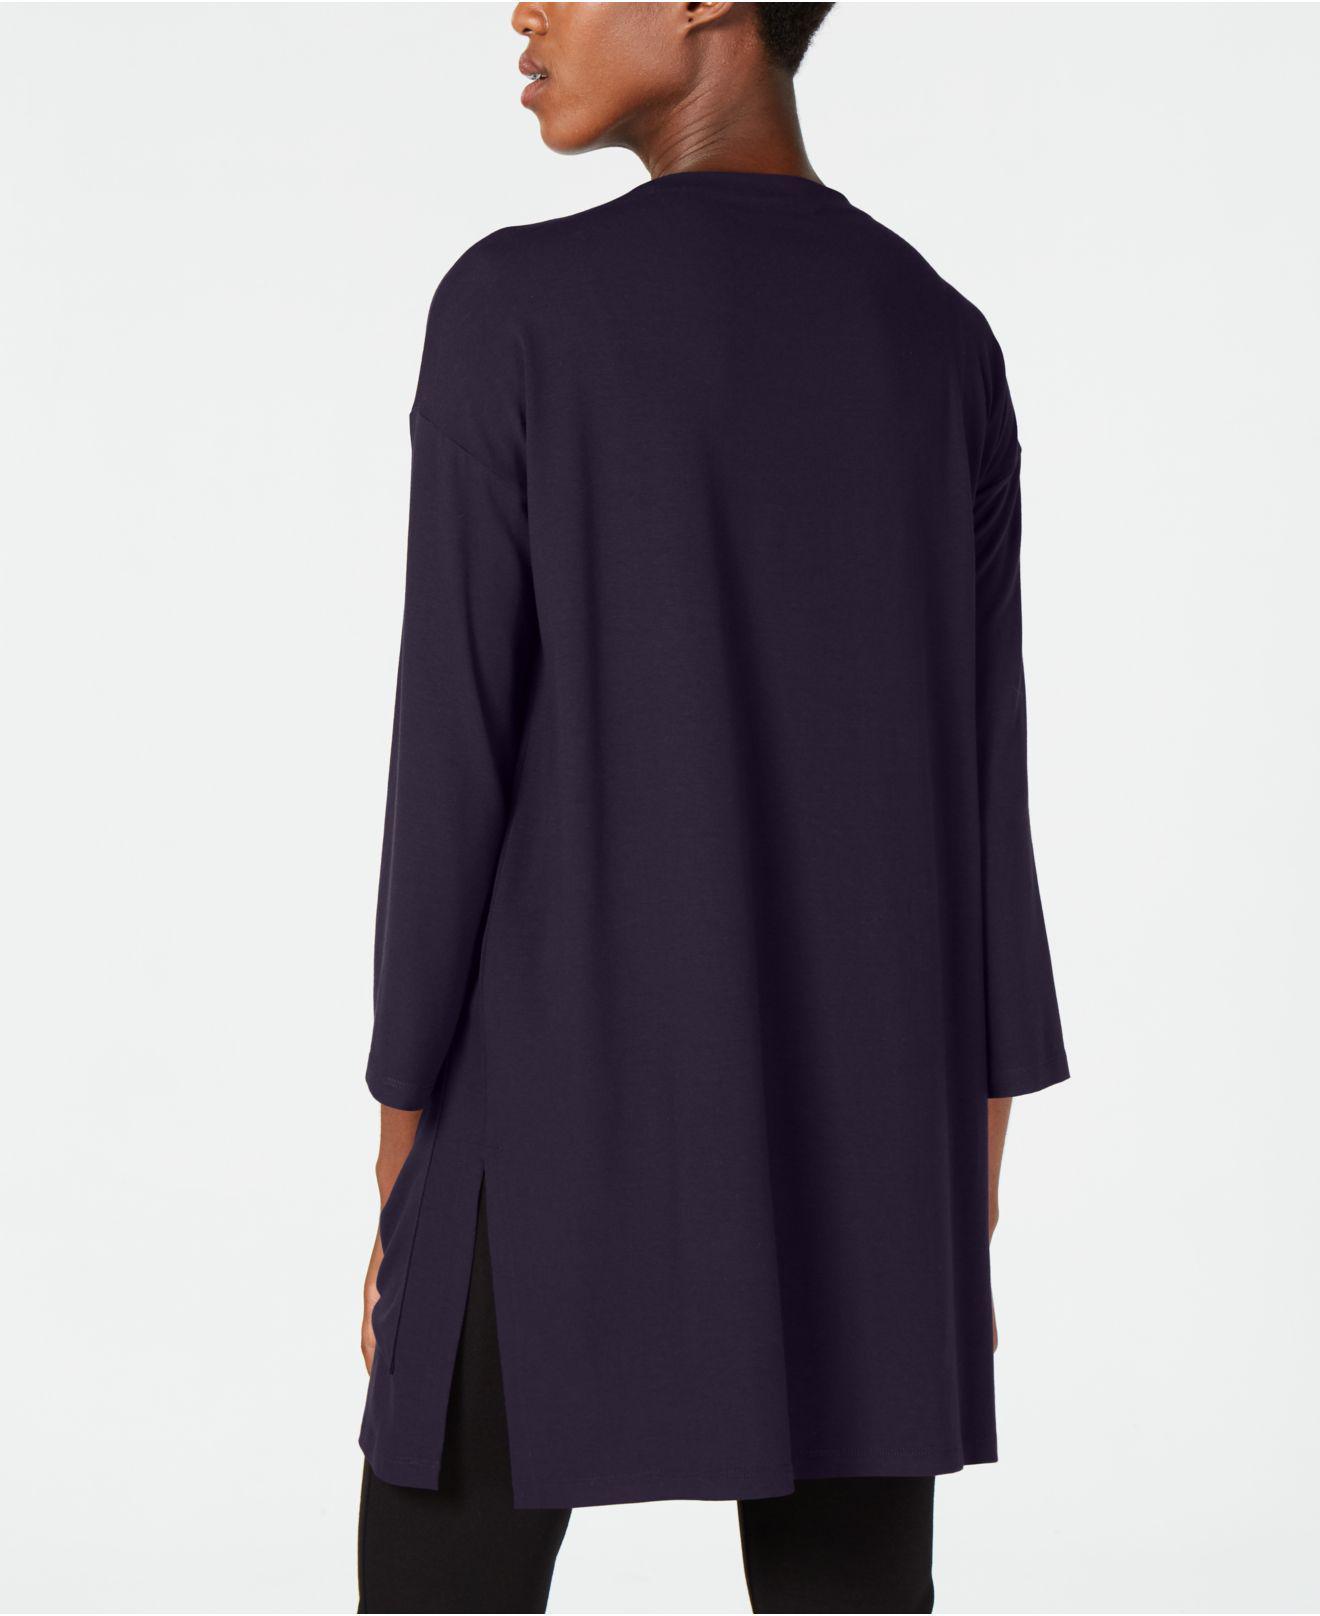 167a67064da Eileen Fisher Stretch Jersey Patch Pocket Tunic, Regular & Petite in ...